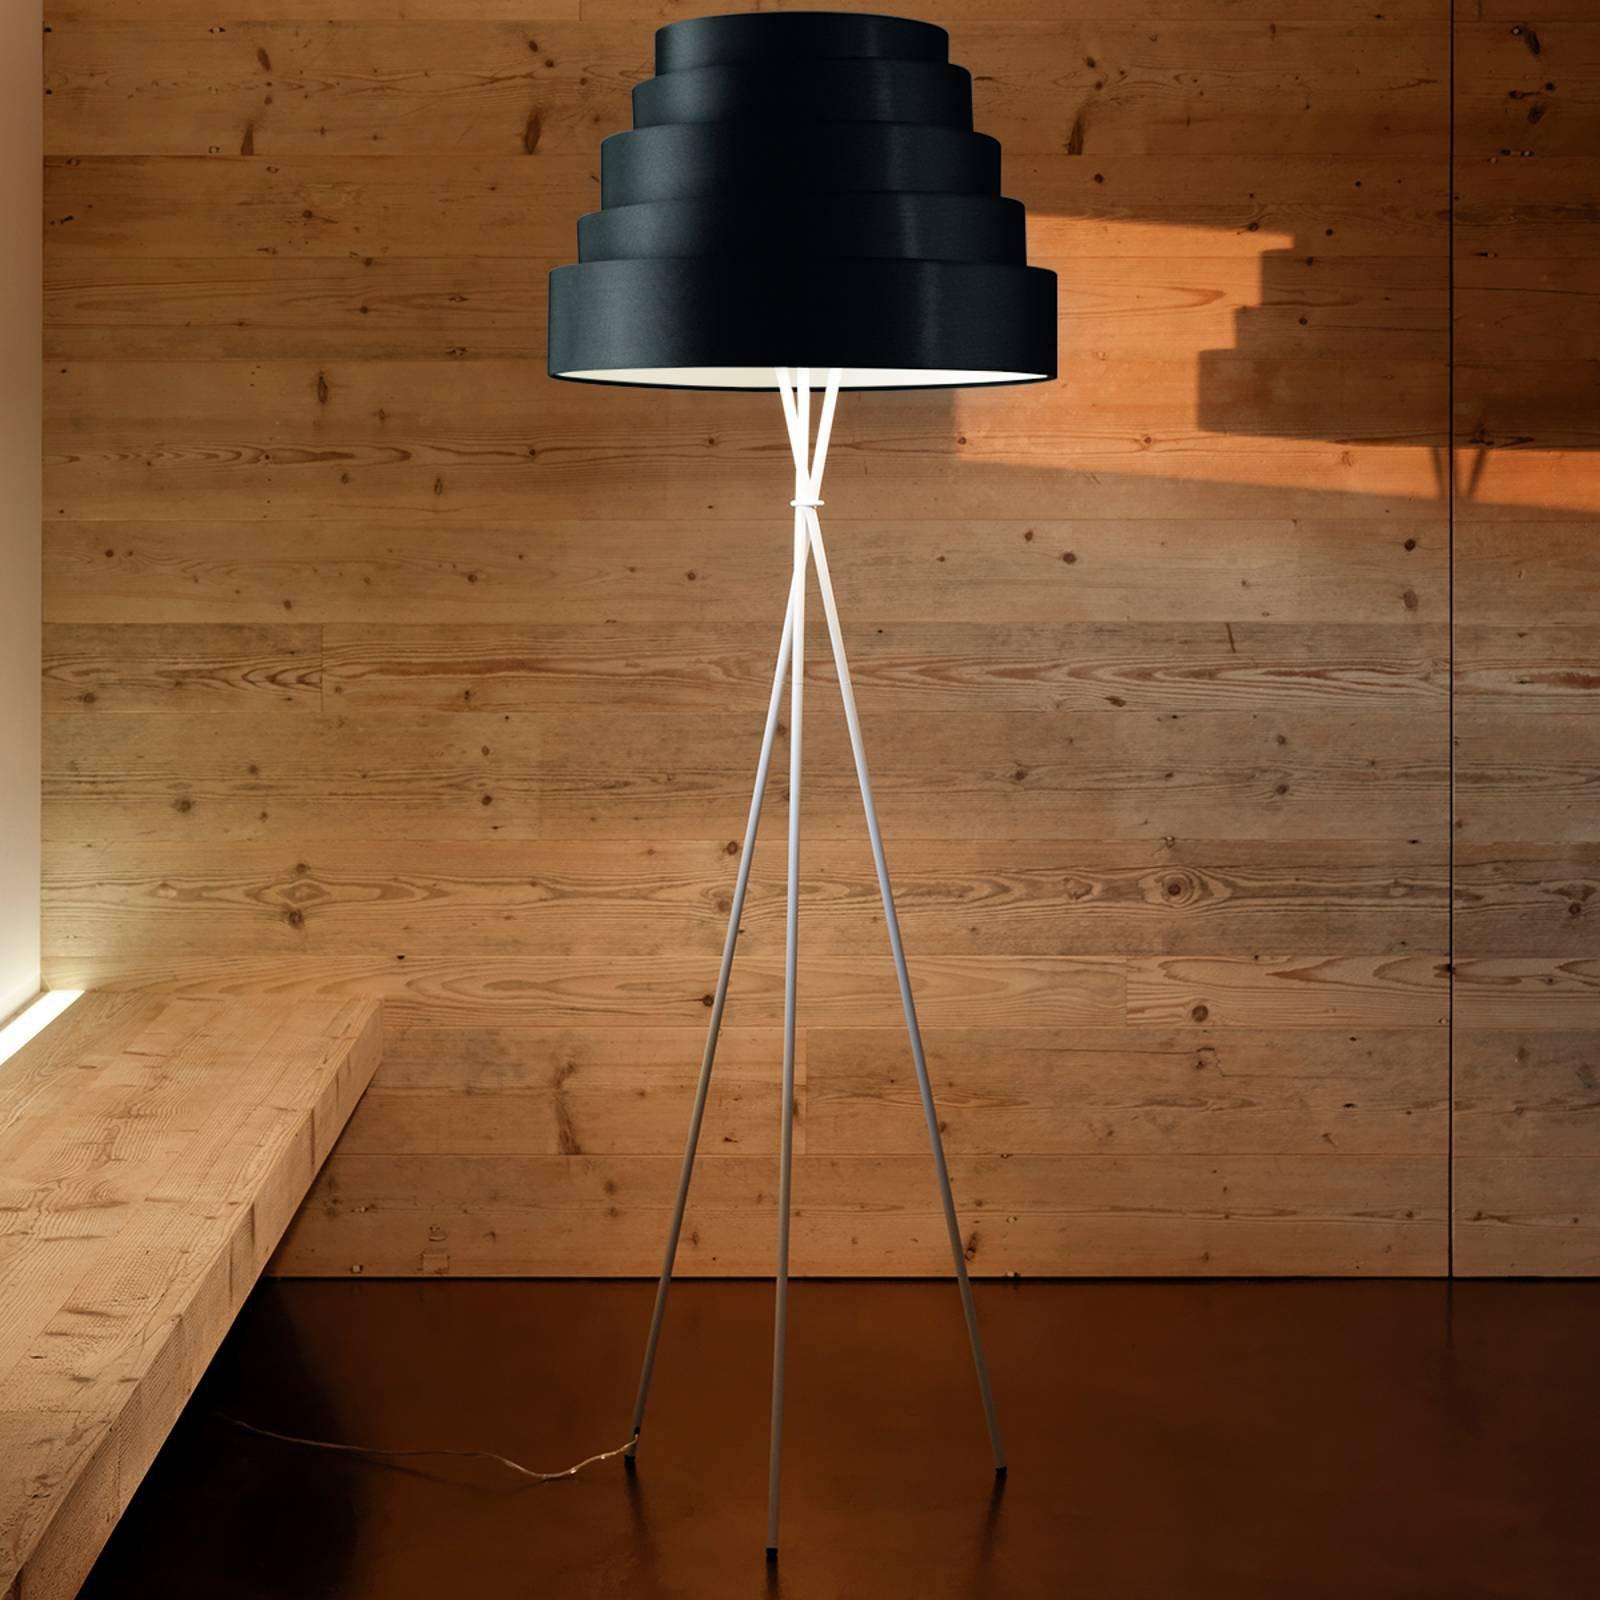 Babel - vakker stålampe på stativ, svart